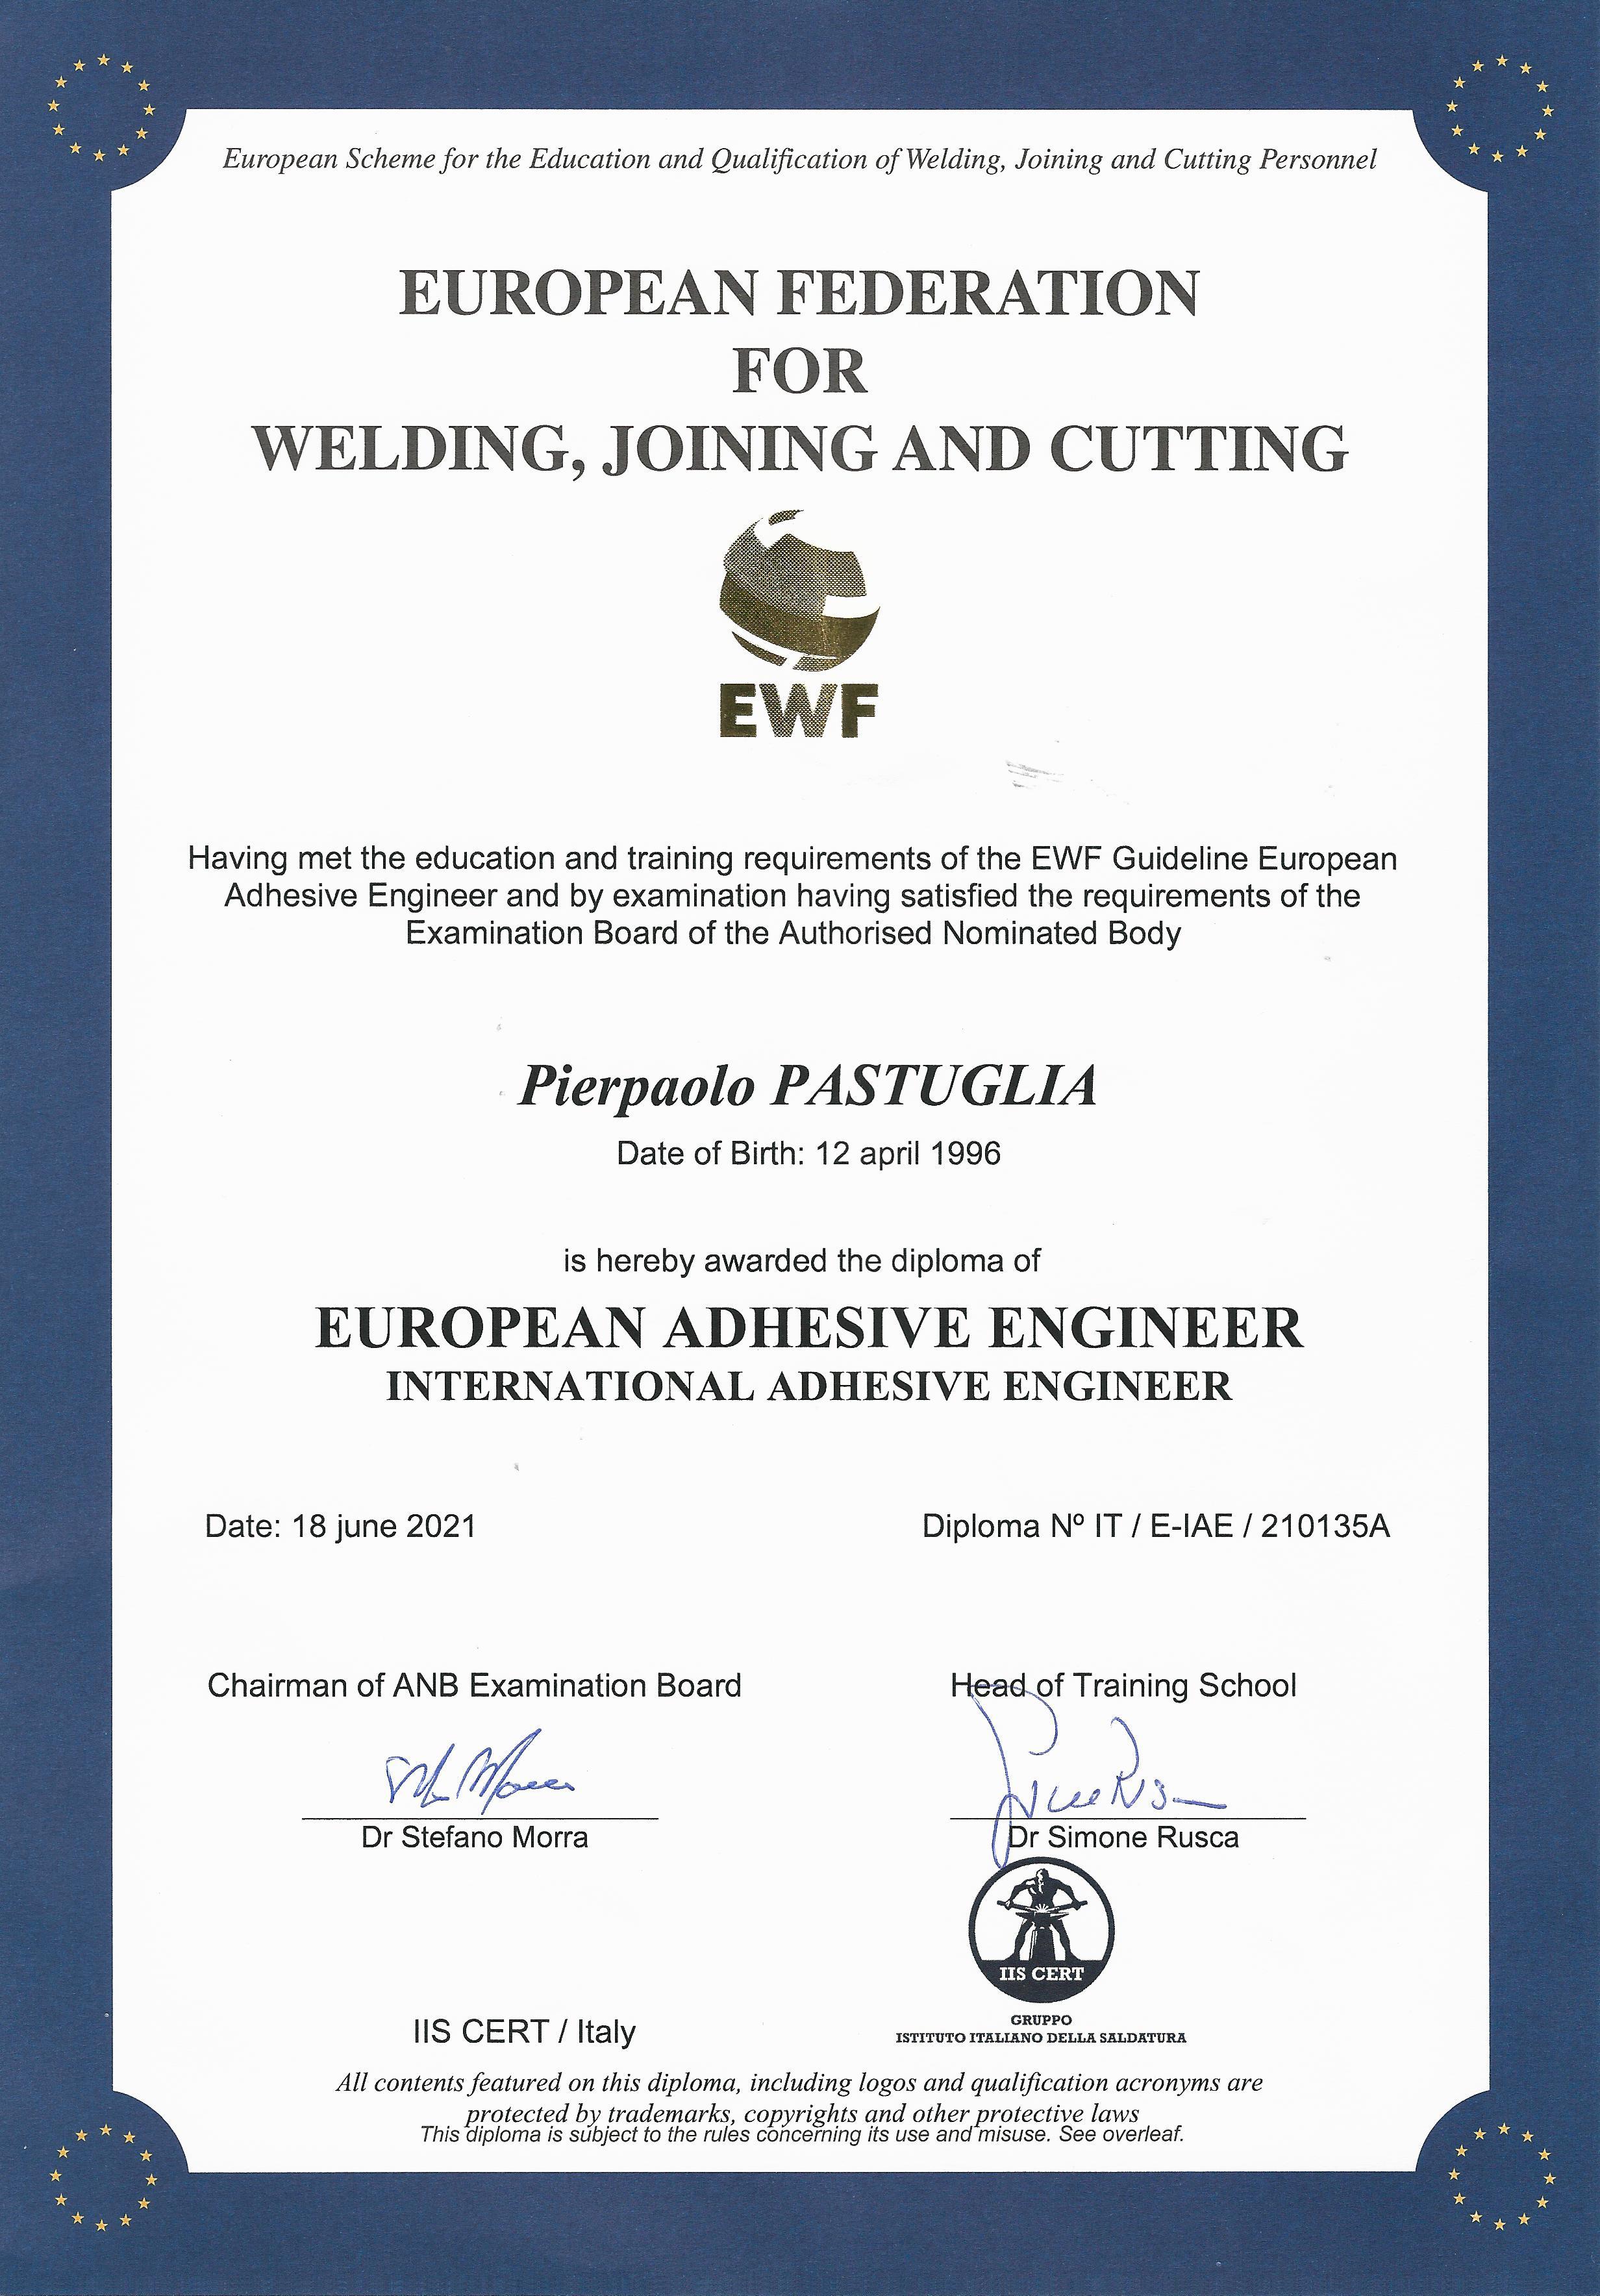 certificazione European Adhesive Engineer